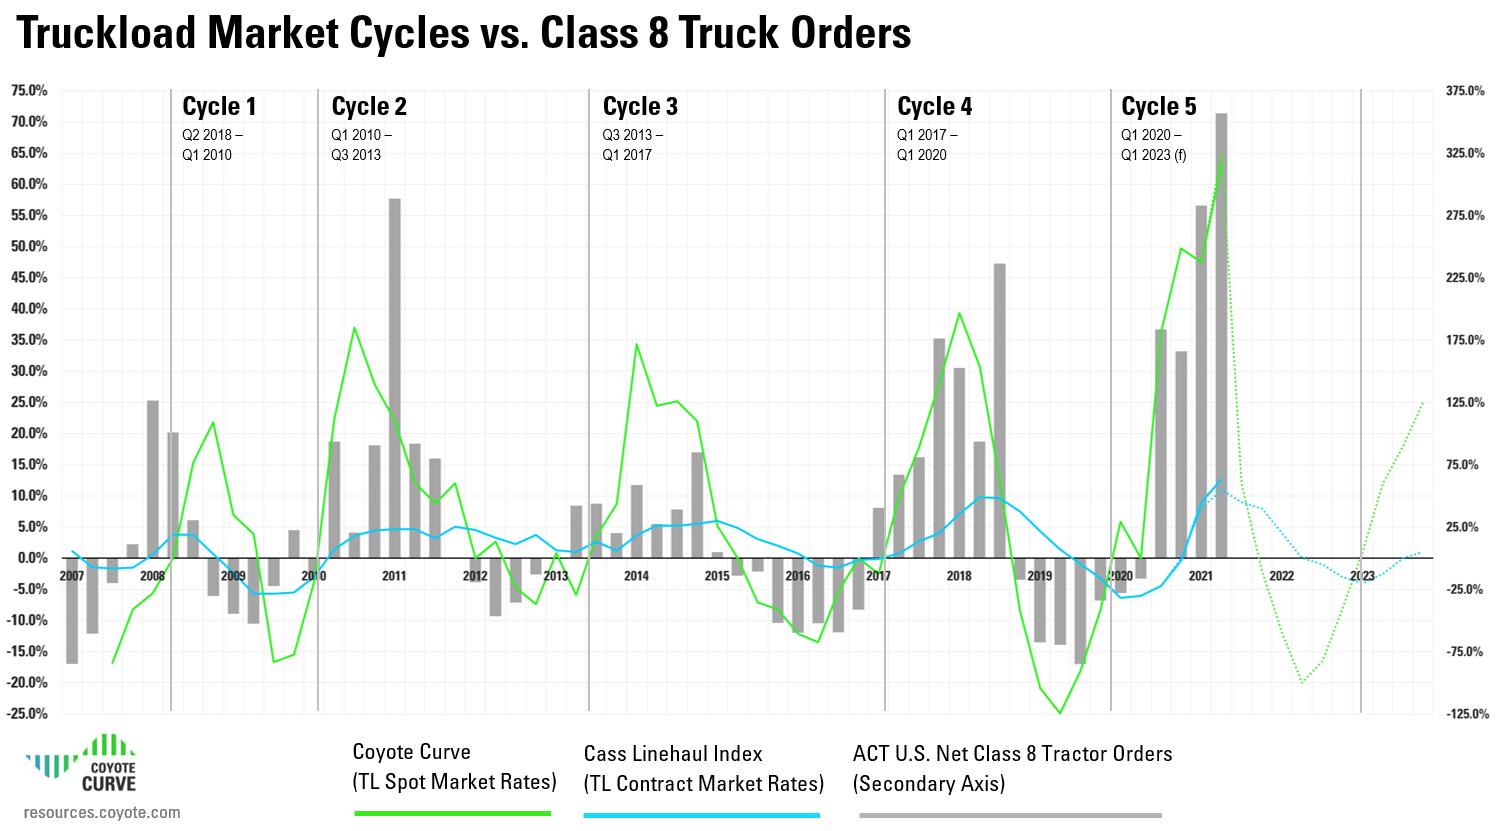 Q3 2021 truckload market cycle vs truck order, coyote curve